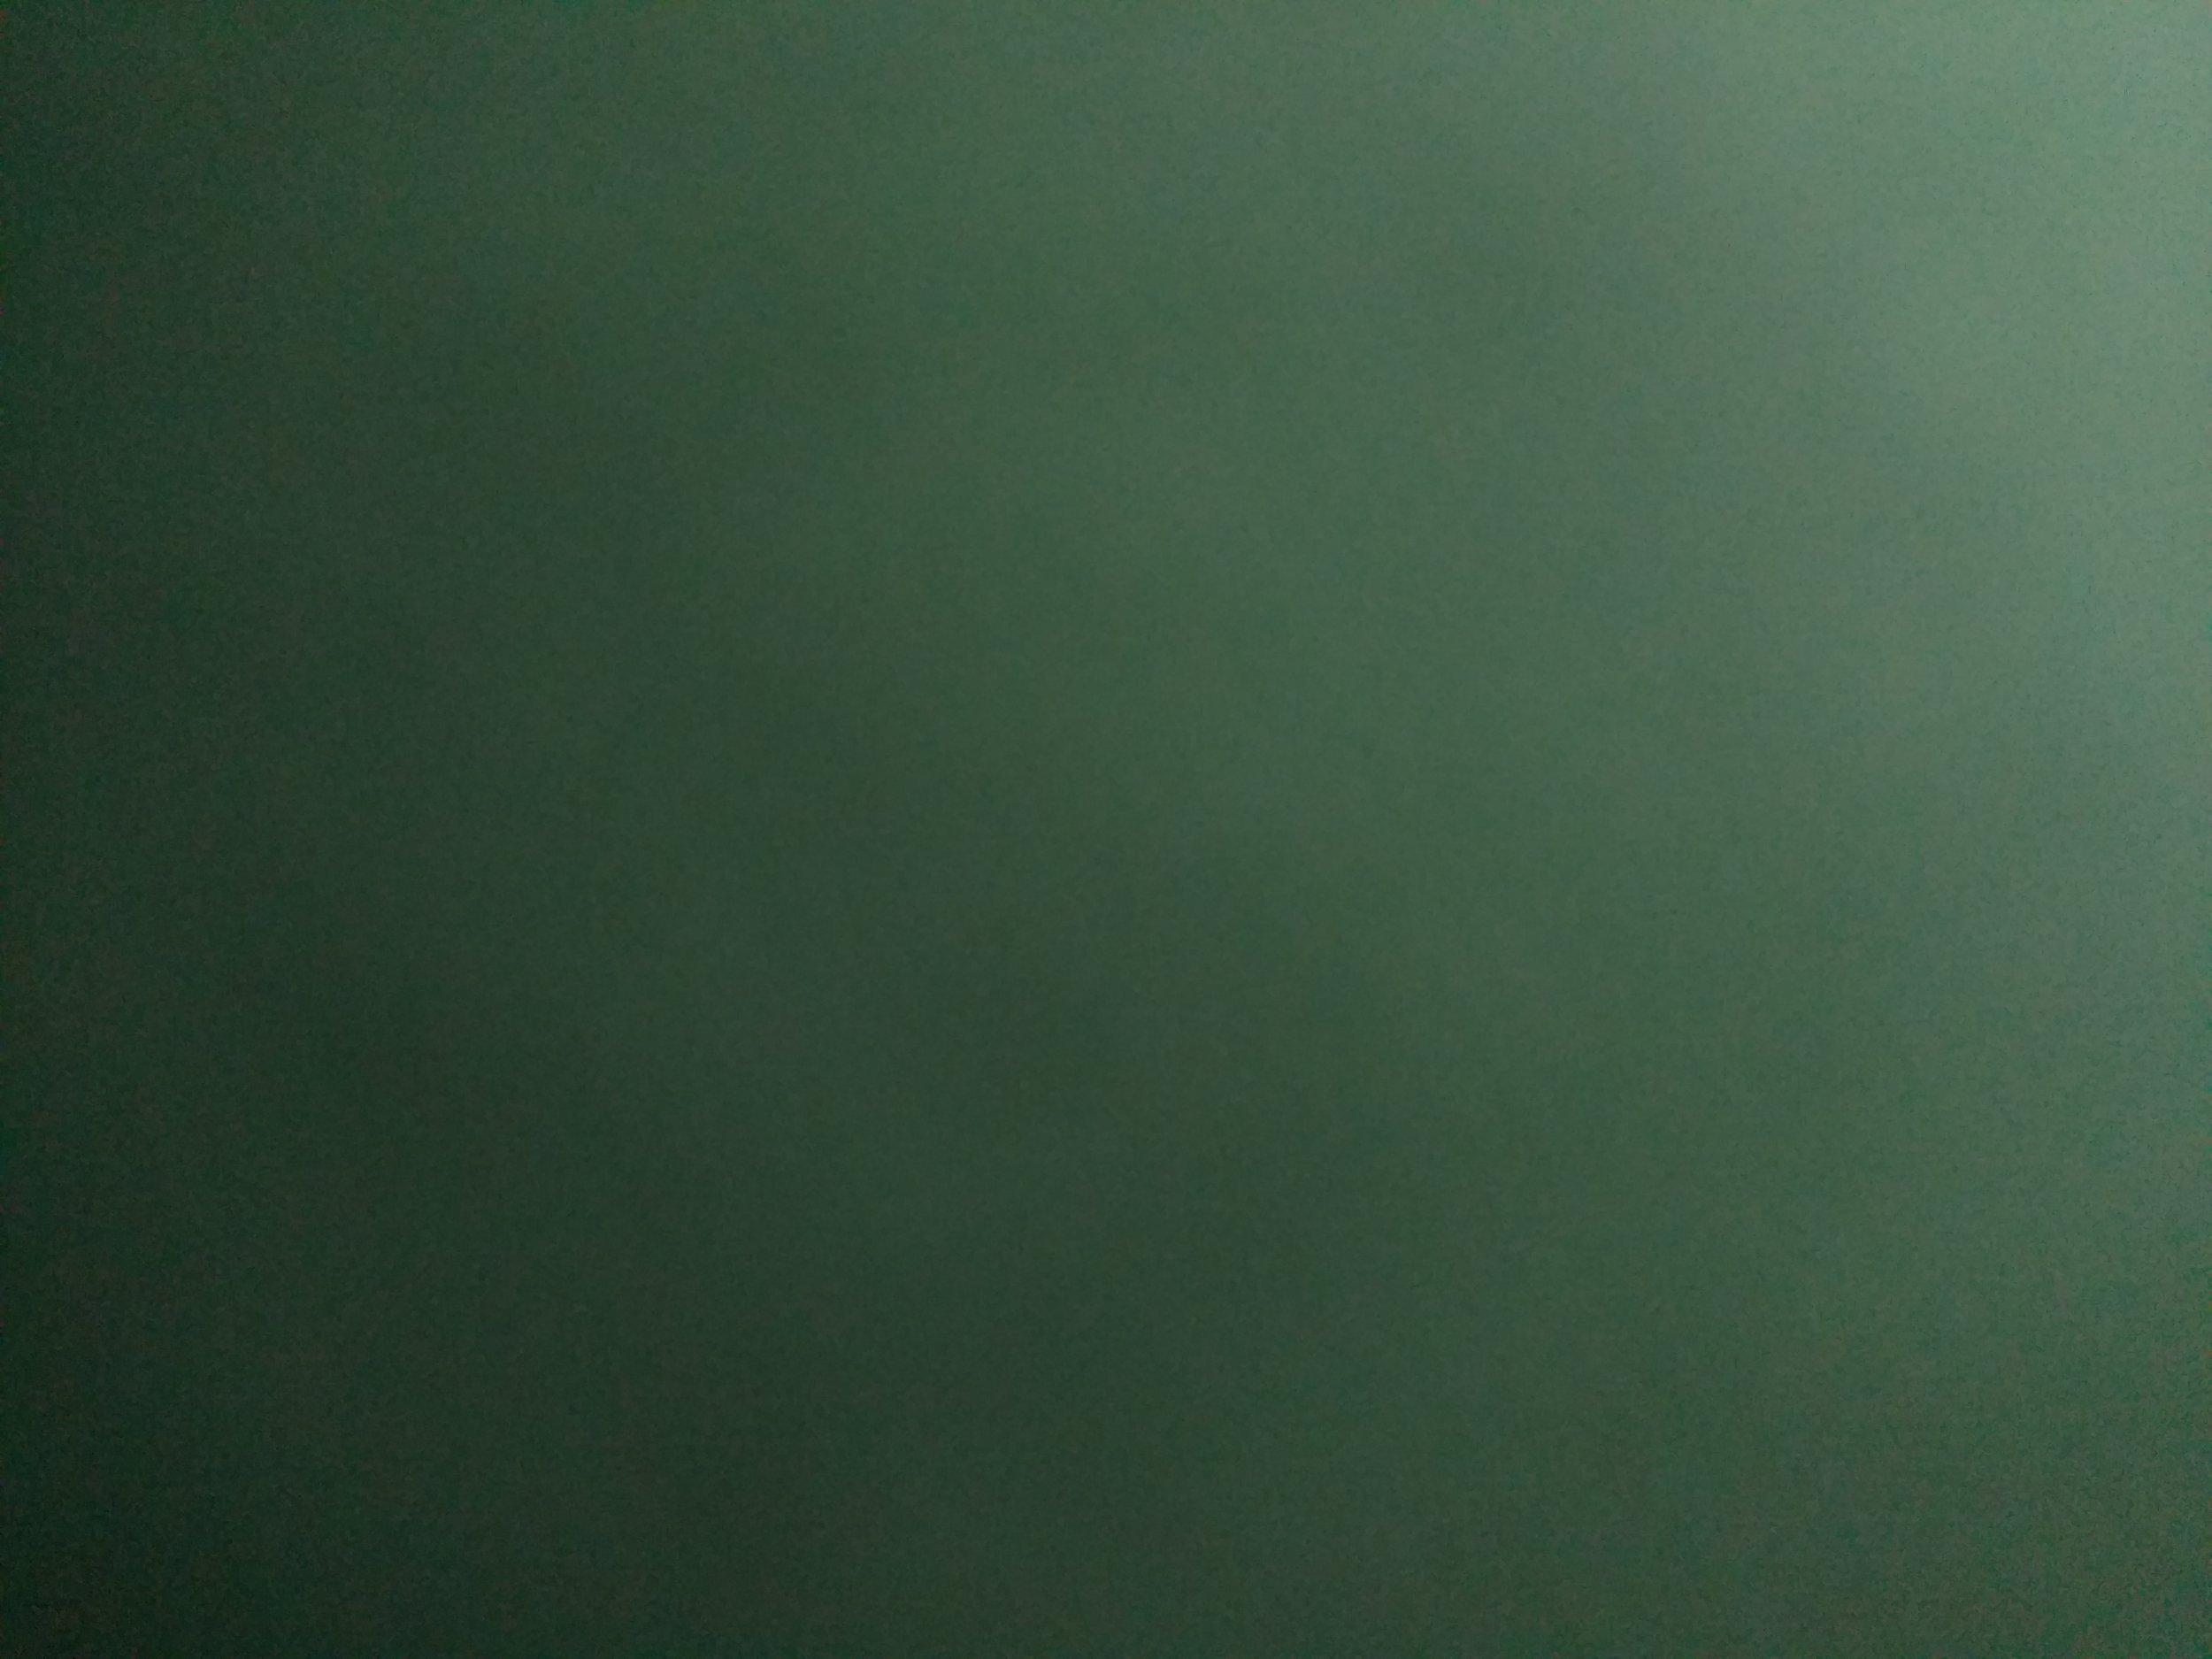 willroth-co-free-texture-gradient-038.jpg